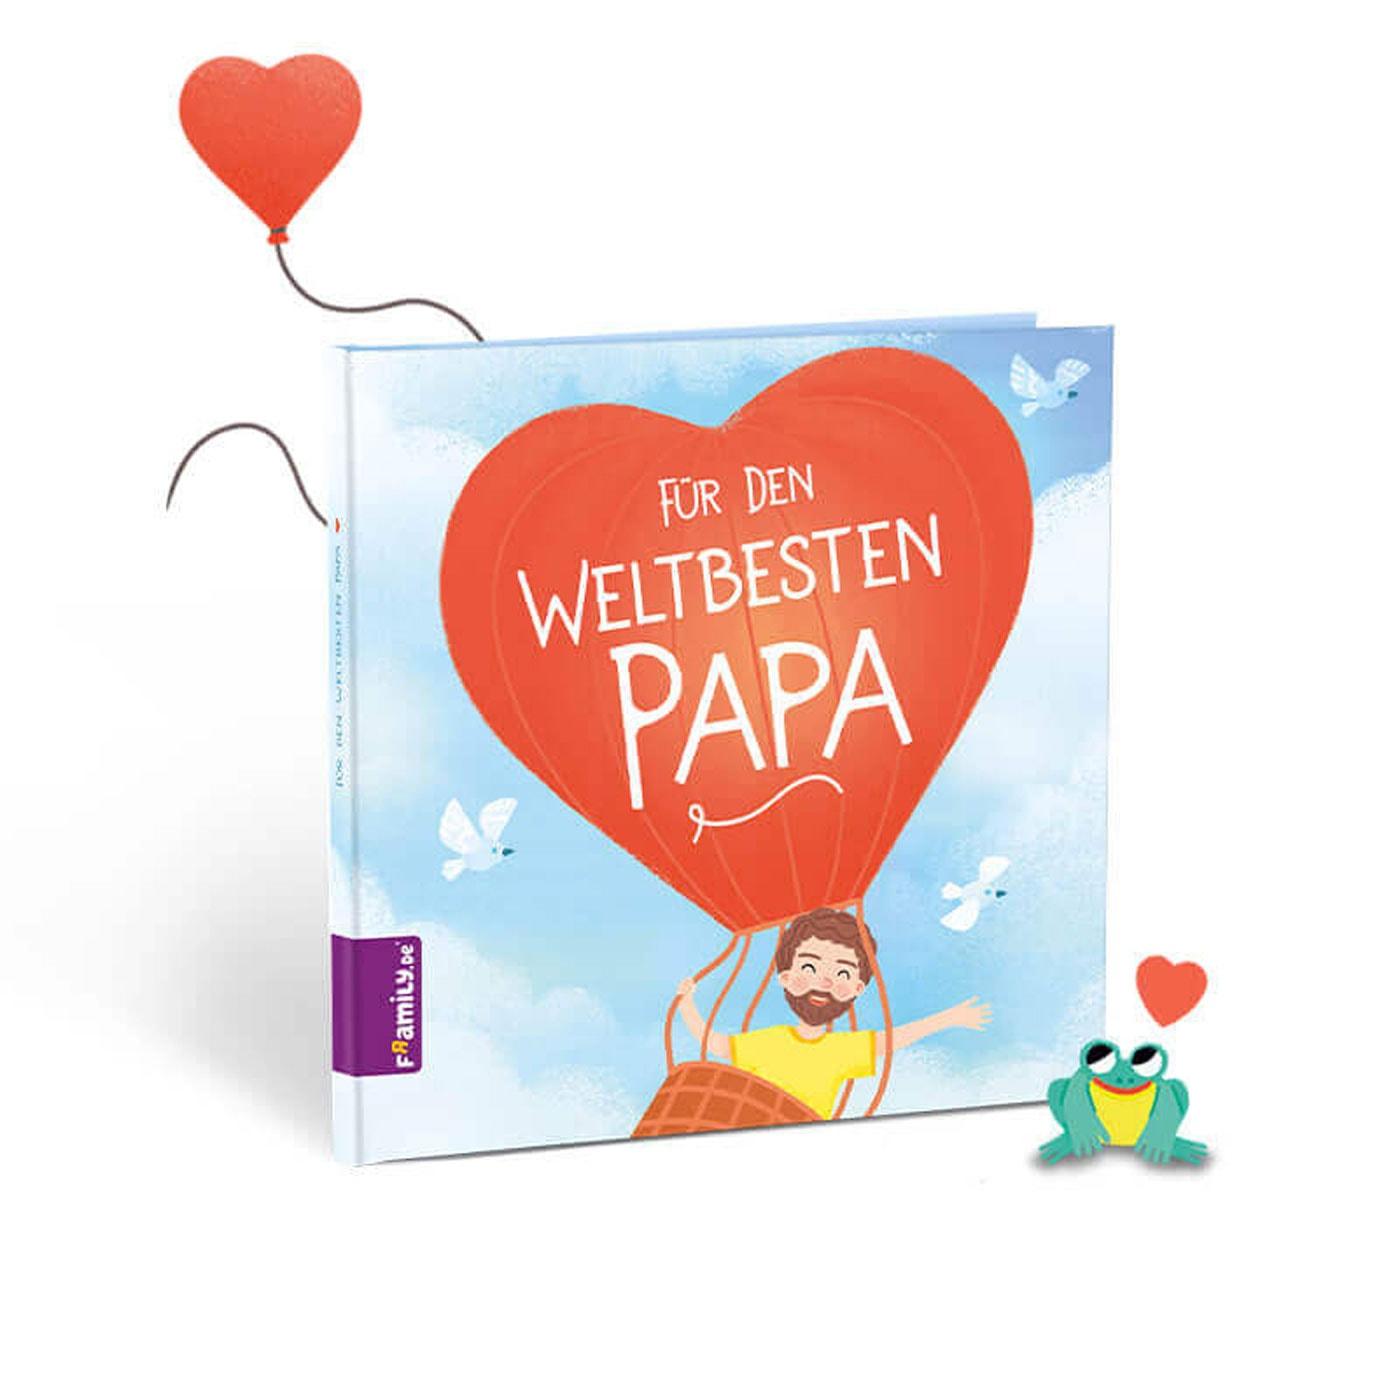 Geschenk zum Vatertag fü den weltbesten Papa // HIMBEER